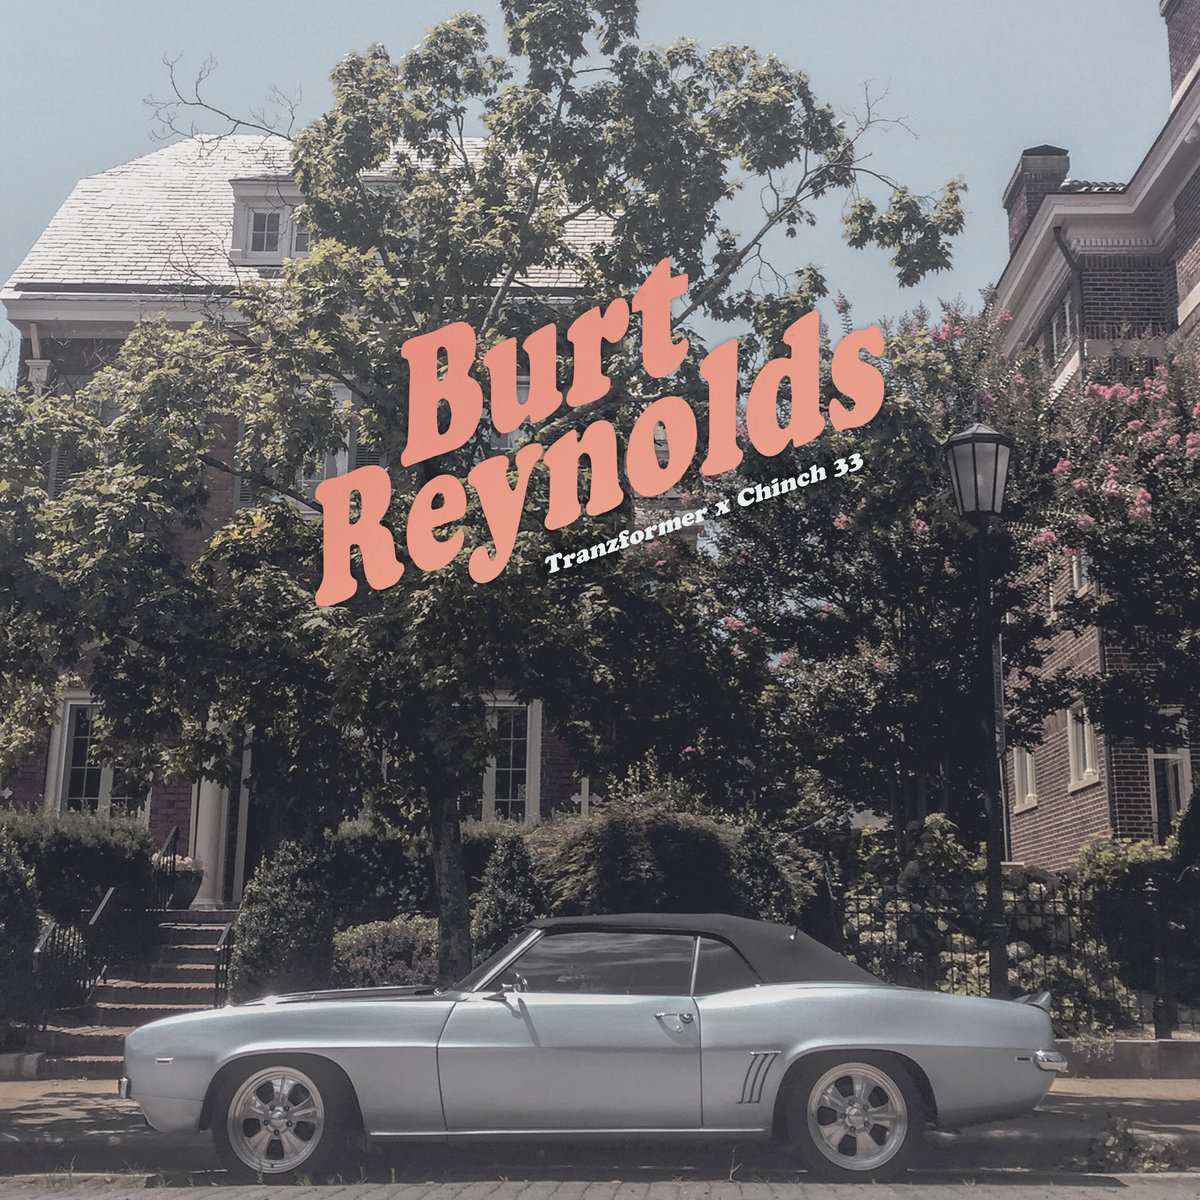 Burt_reynolds_ep